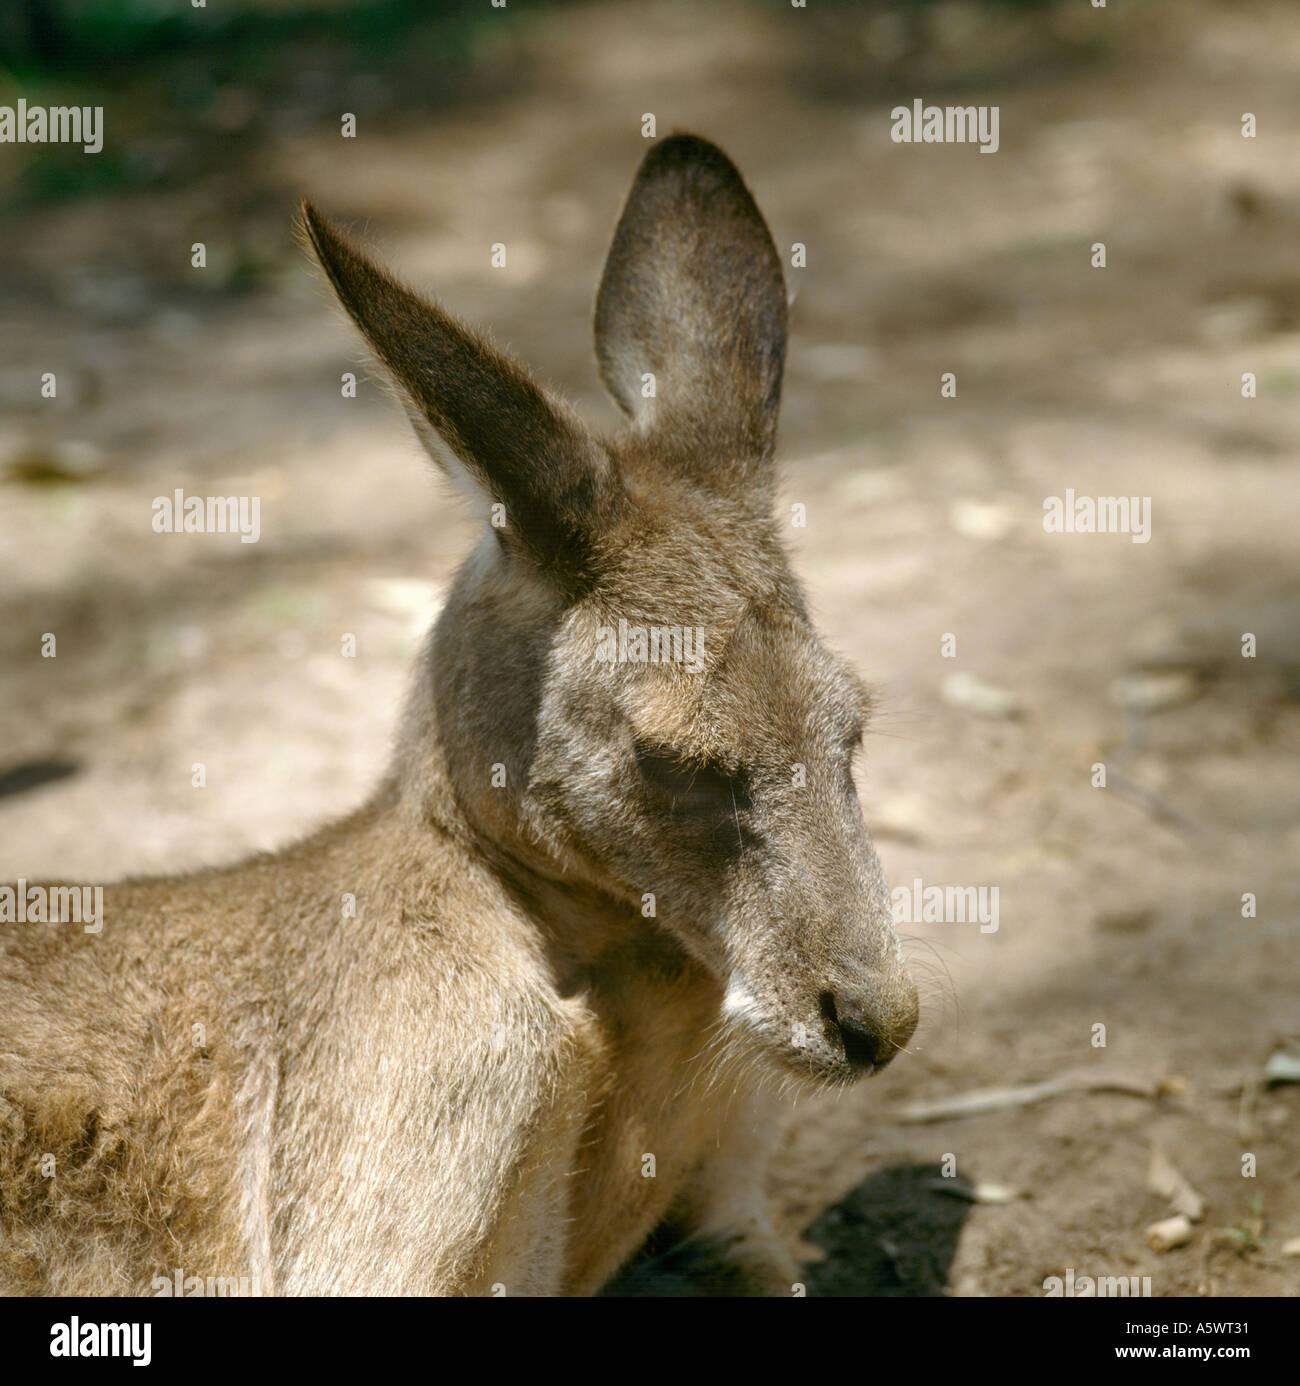 Kangaroo stockfotos kangaroo bilder alamy for Wildparks in der nahe